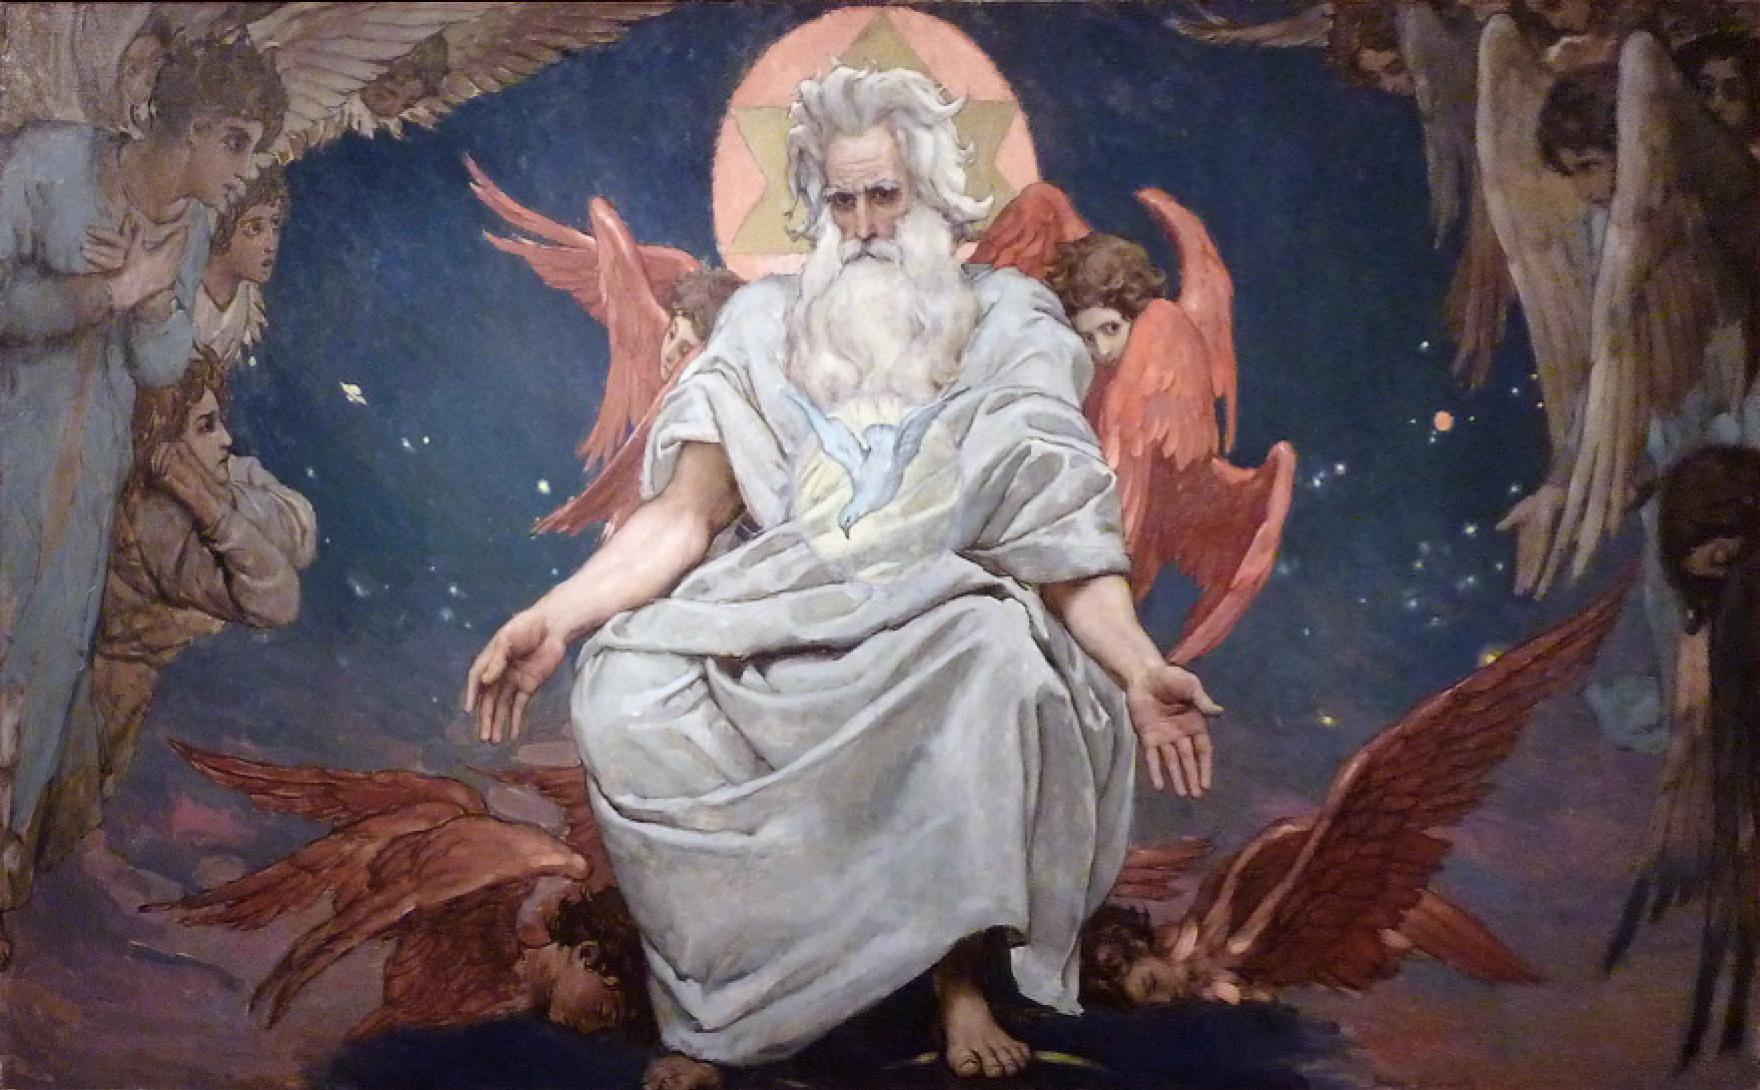 Виктор Васнецов, 1896 год, картина «Бог Саваоф».